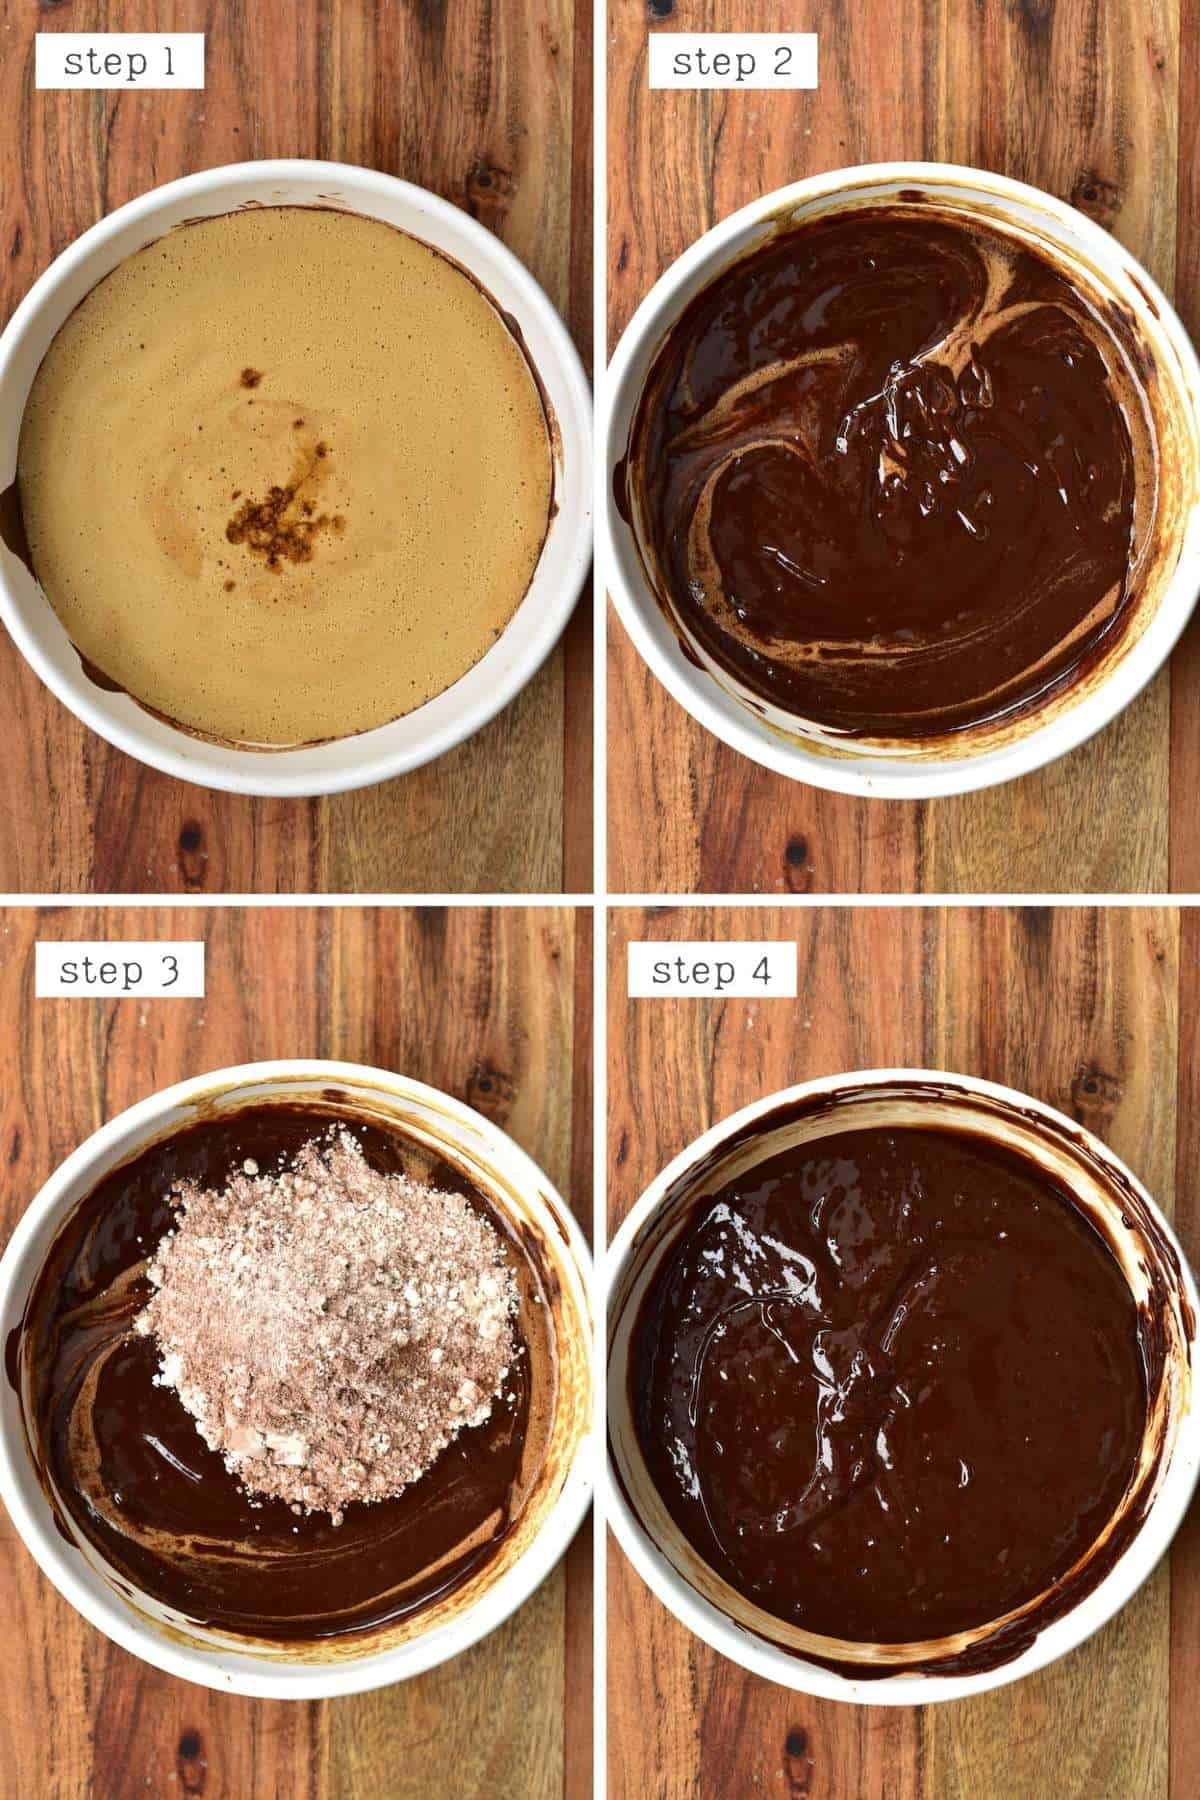 Steps for preparing brownie batter